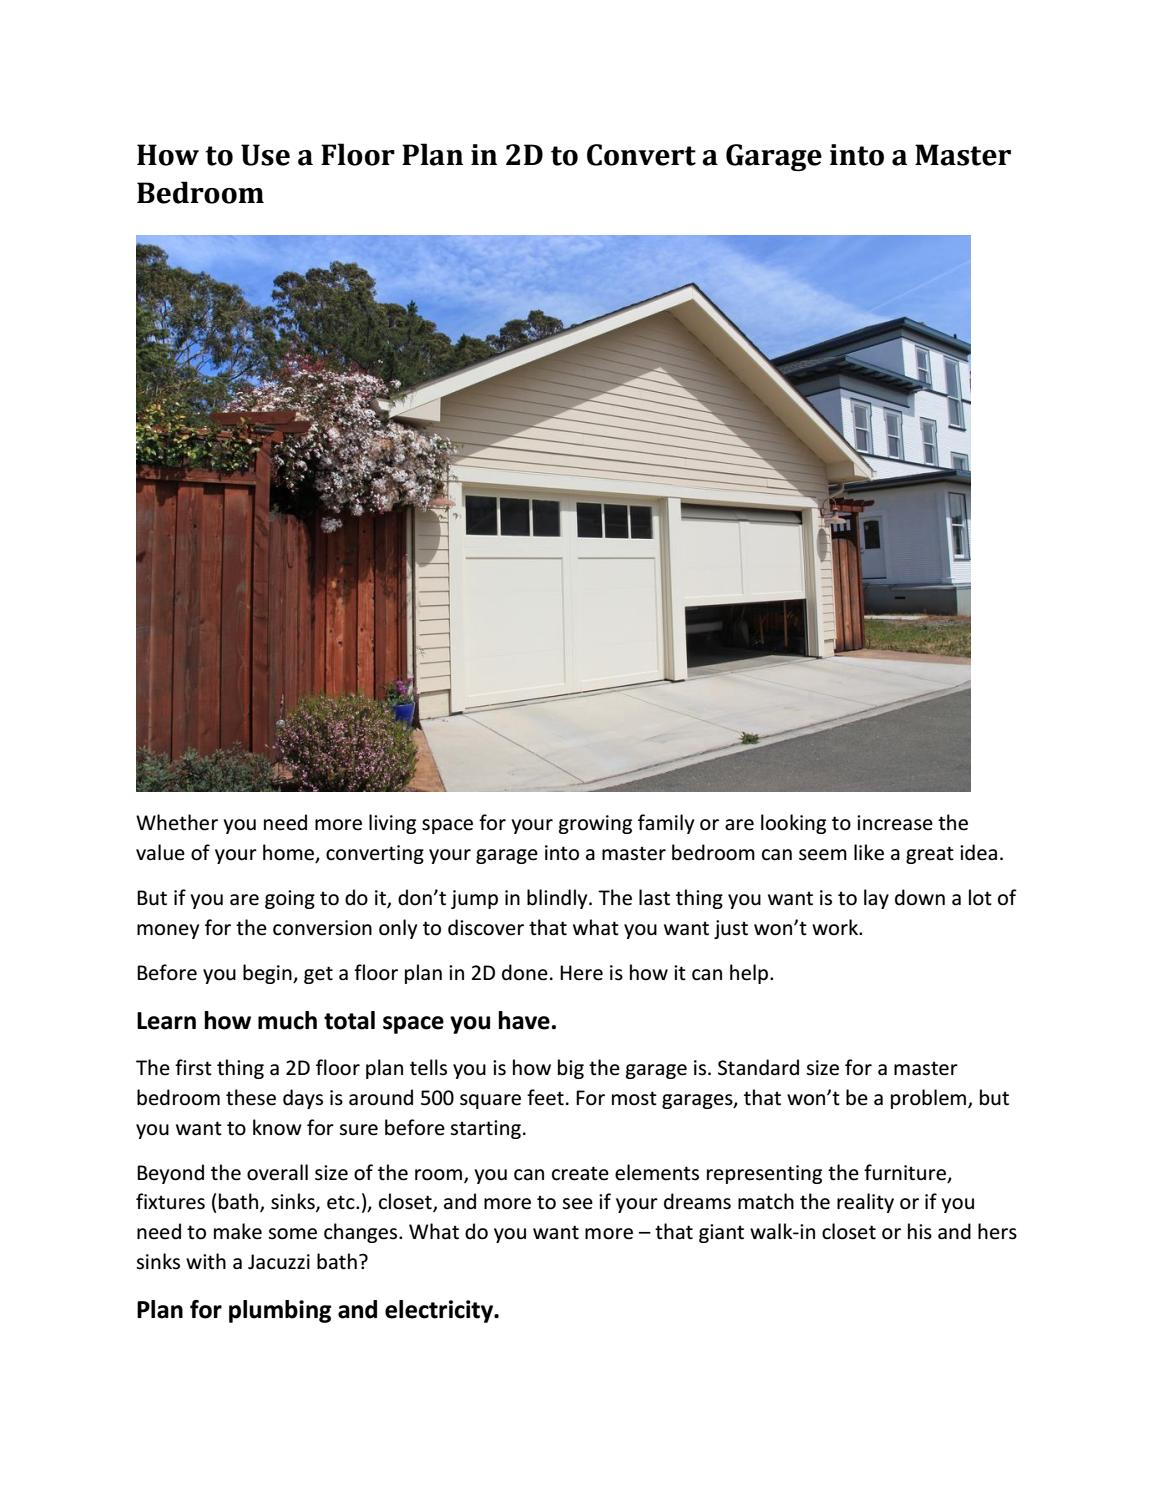 Mysiteplan How To Convert A Garage Into Master Bedroom